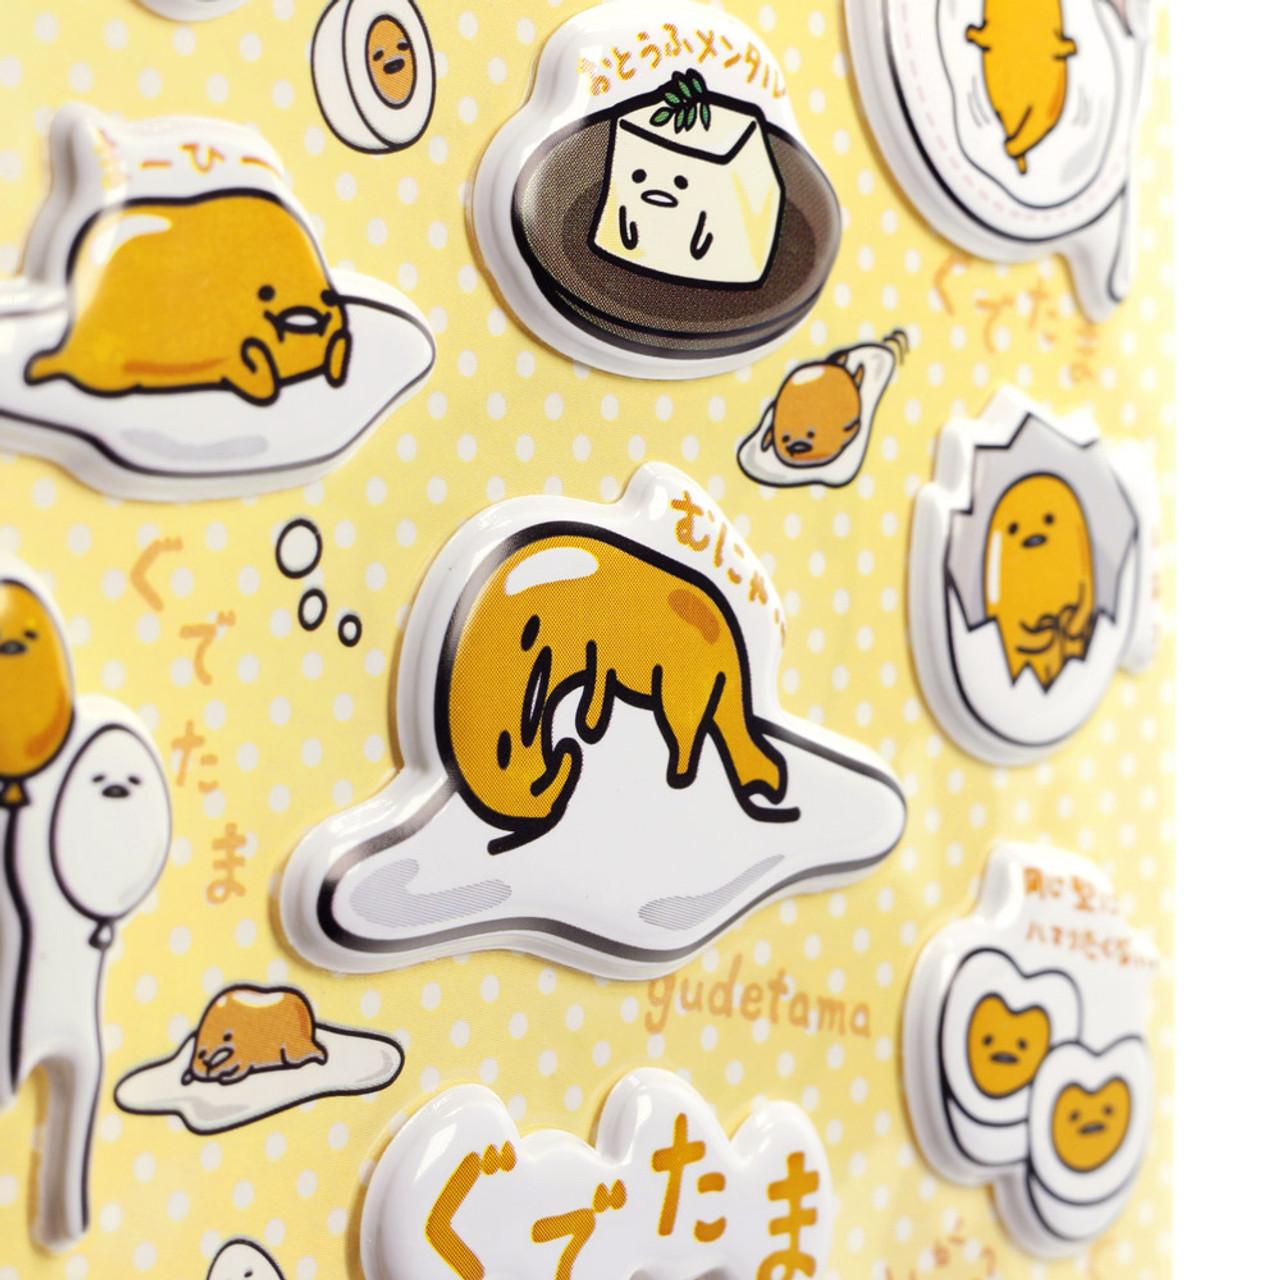 Sanrio Gudetama Lazy Egg Breakfast Series 3D Bulge Stationery Sticker ( Close Up 02 )